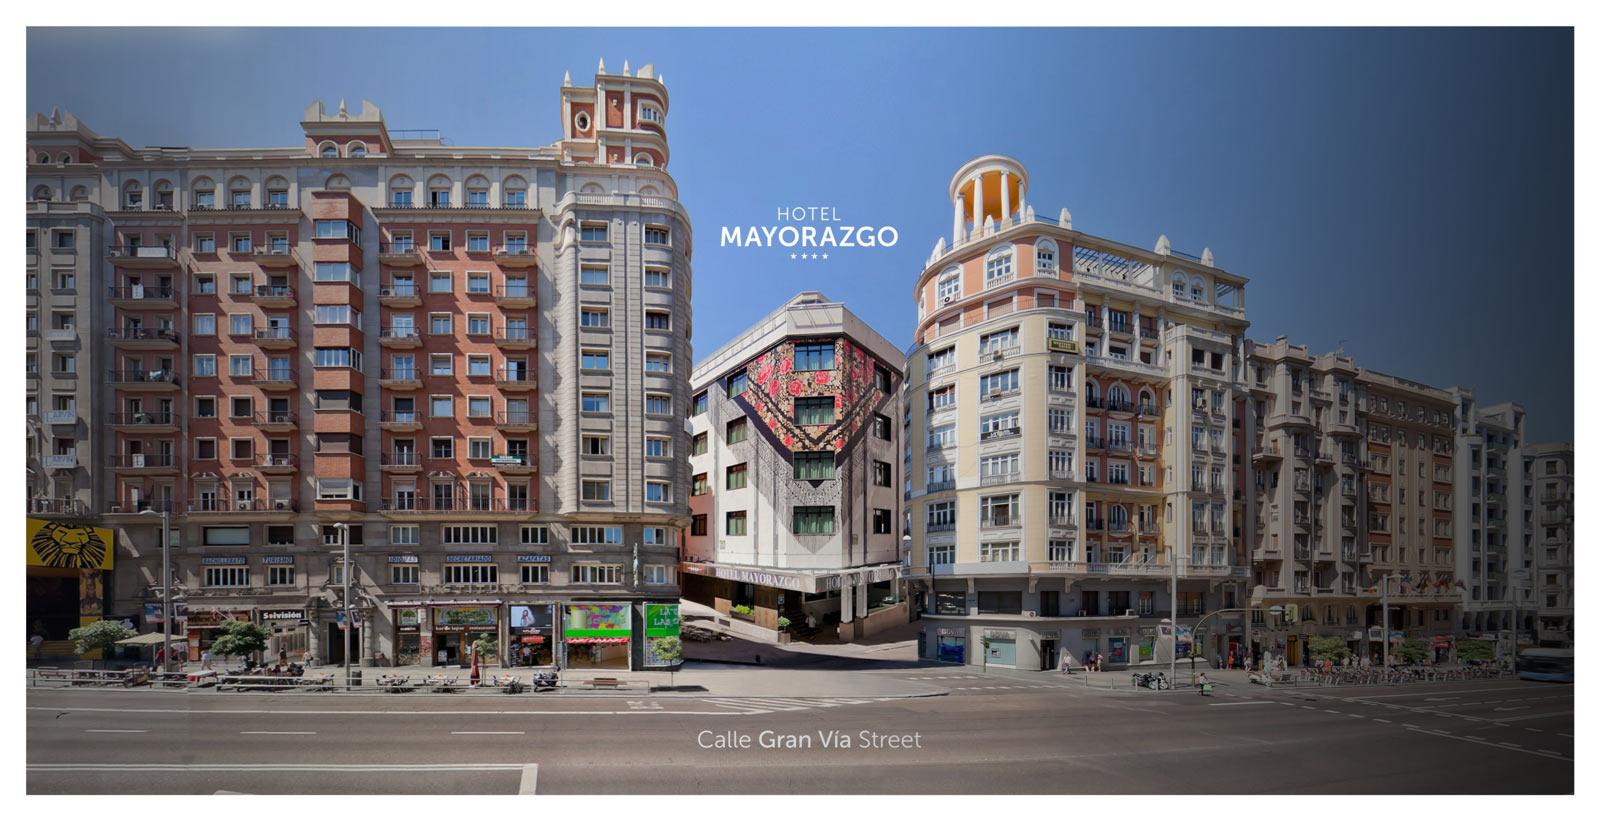 Galer A Hotel Mayorazgo Madrid